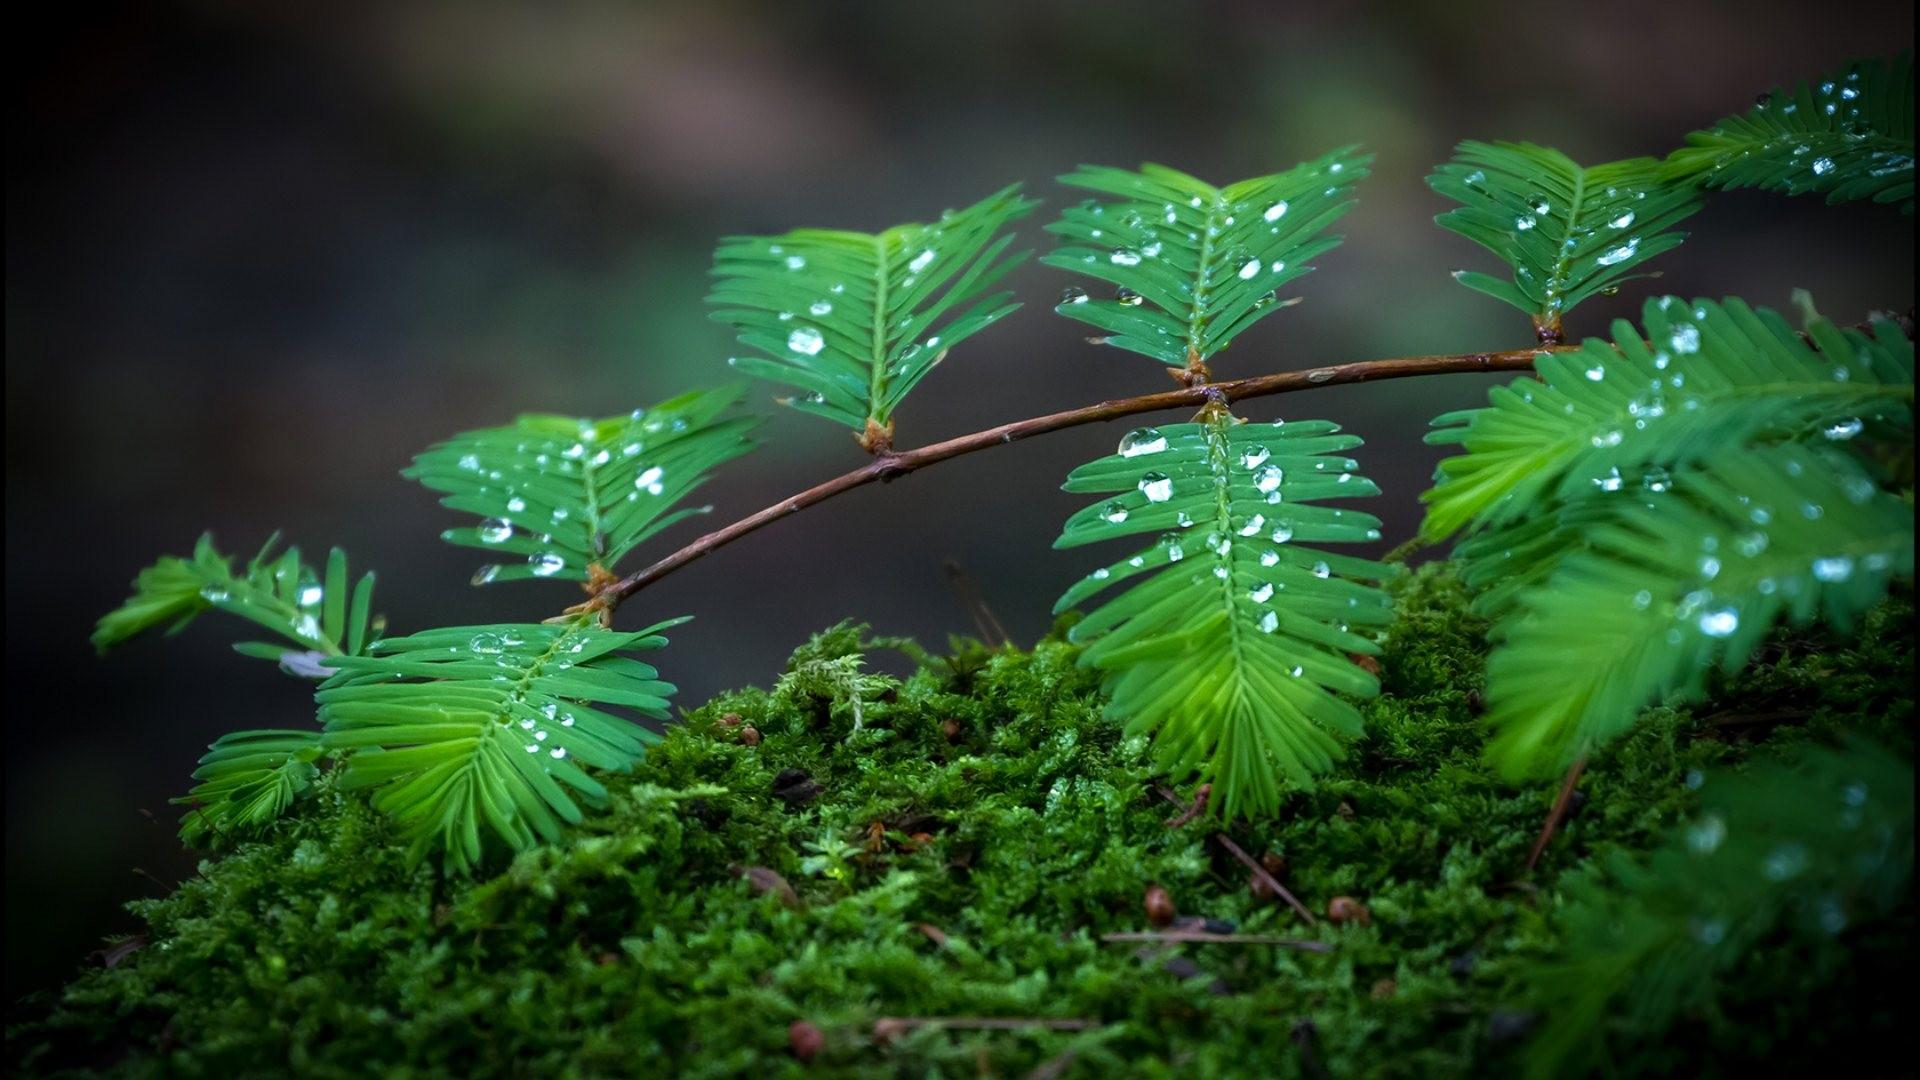 Green Leaves Water Rain HD Wallpapers Desktop Images Full 4k High 1920x1080